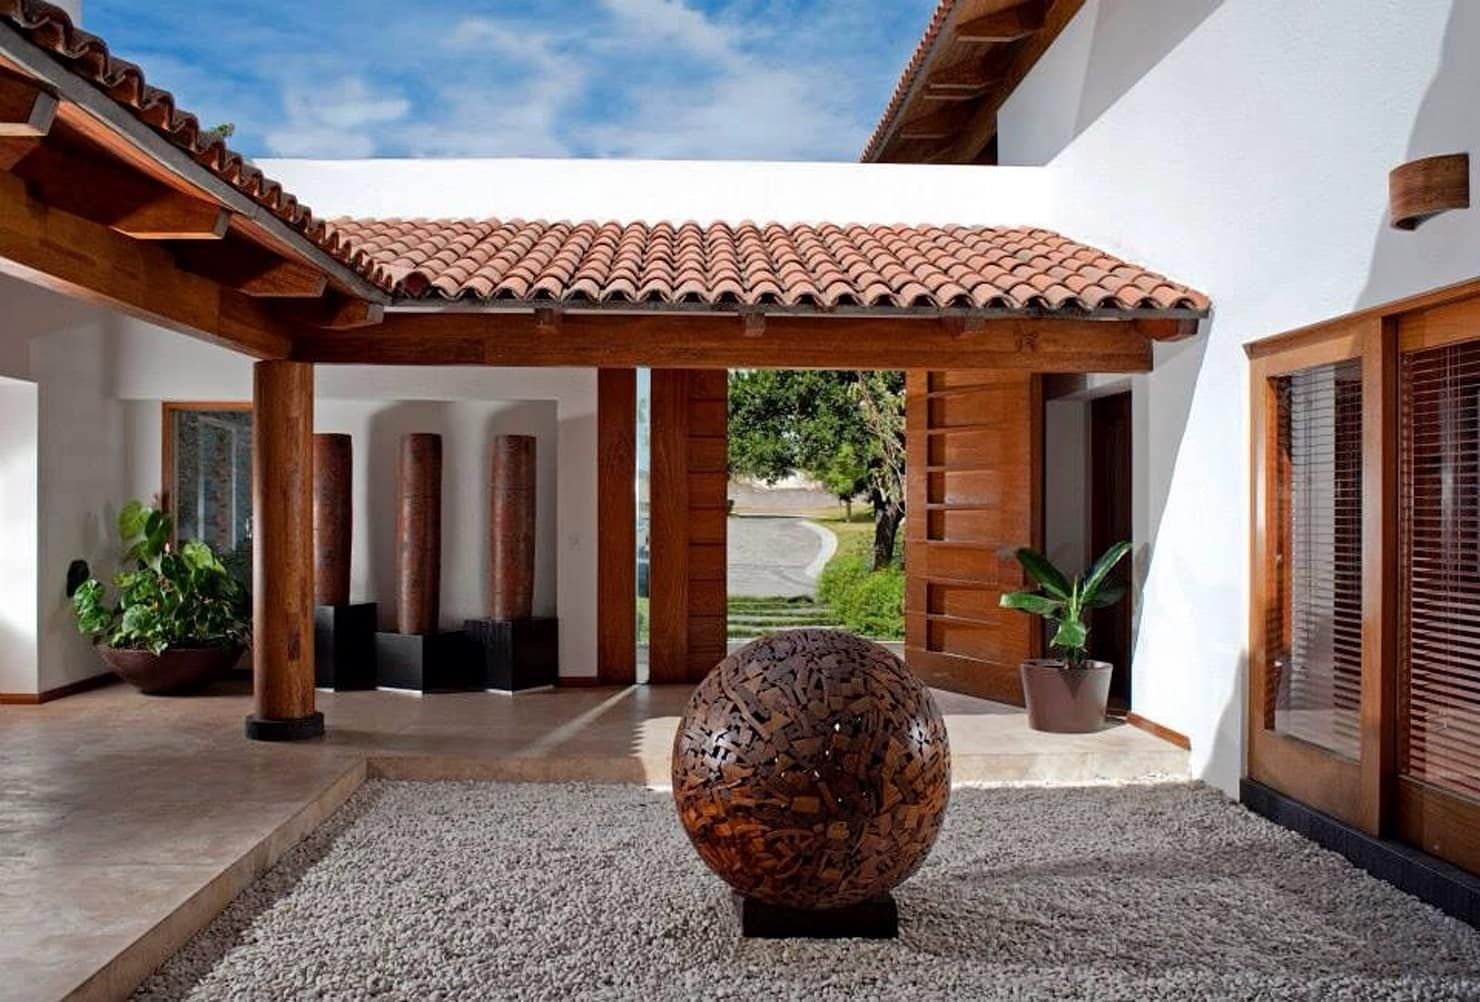 Casa De Campo De Diseno Espectacular En Mexico Homify Homify Casas Coloniales Casas De Campo Casas Tradicionales